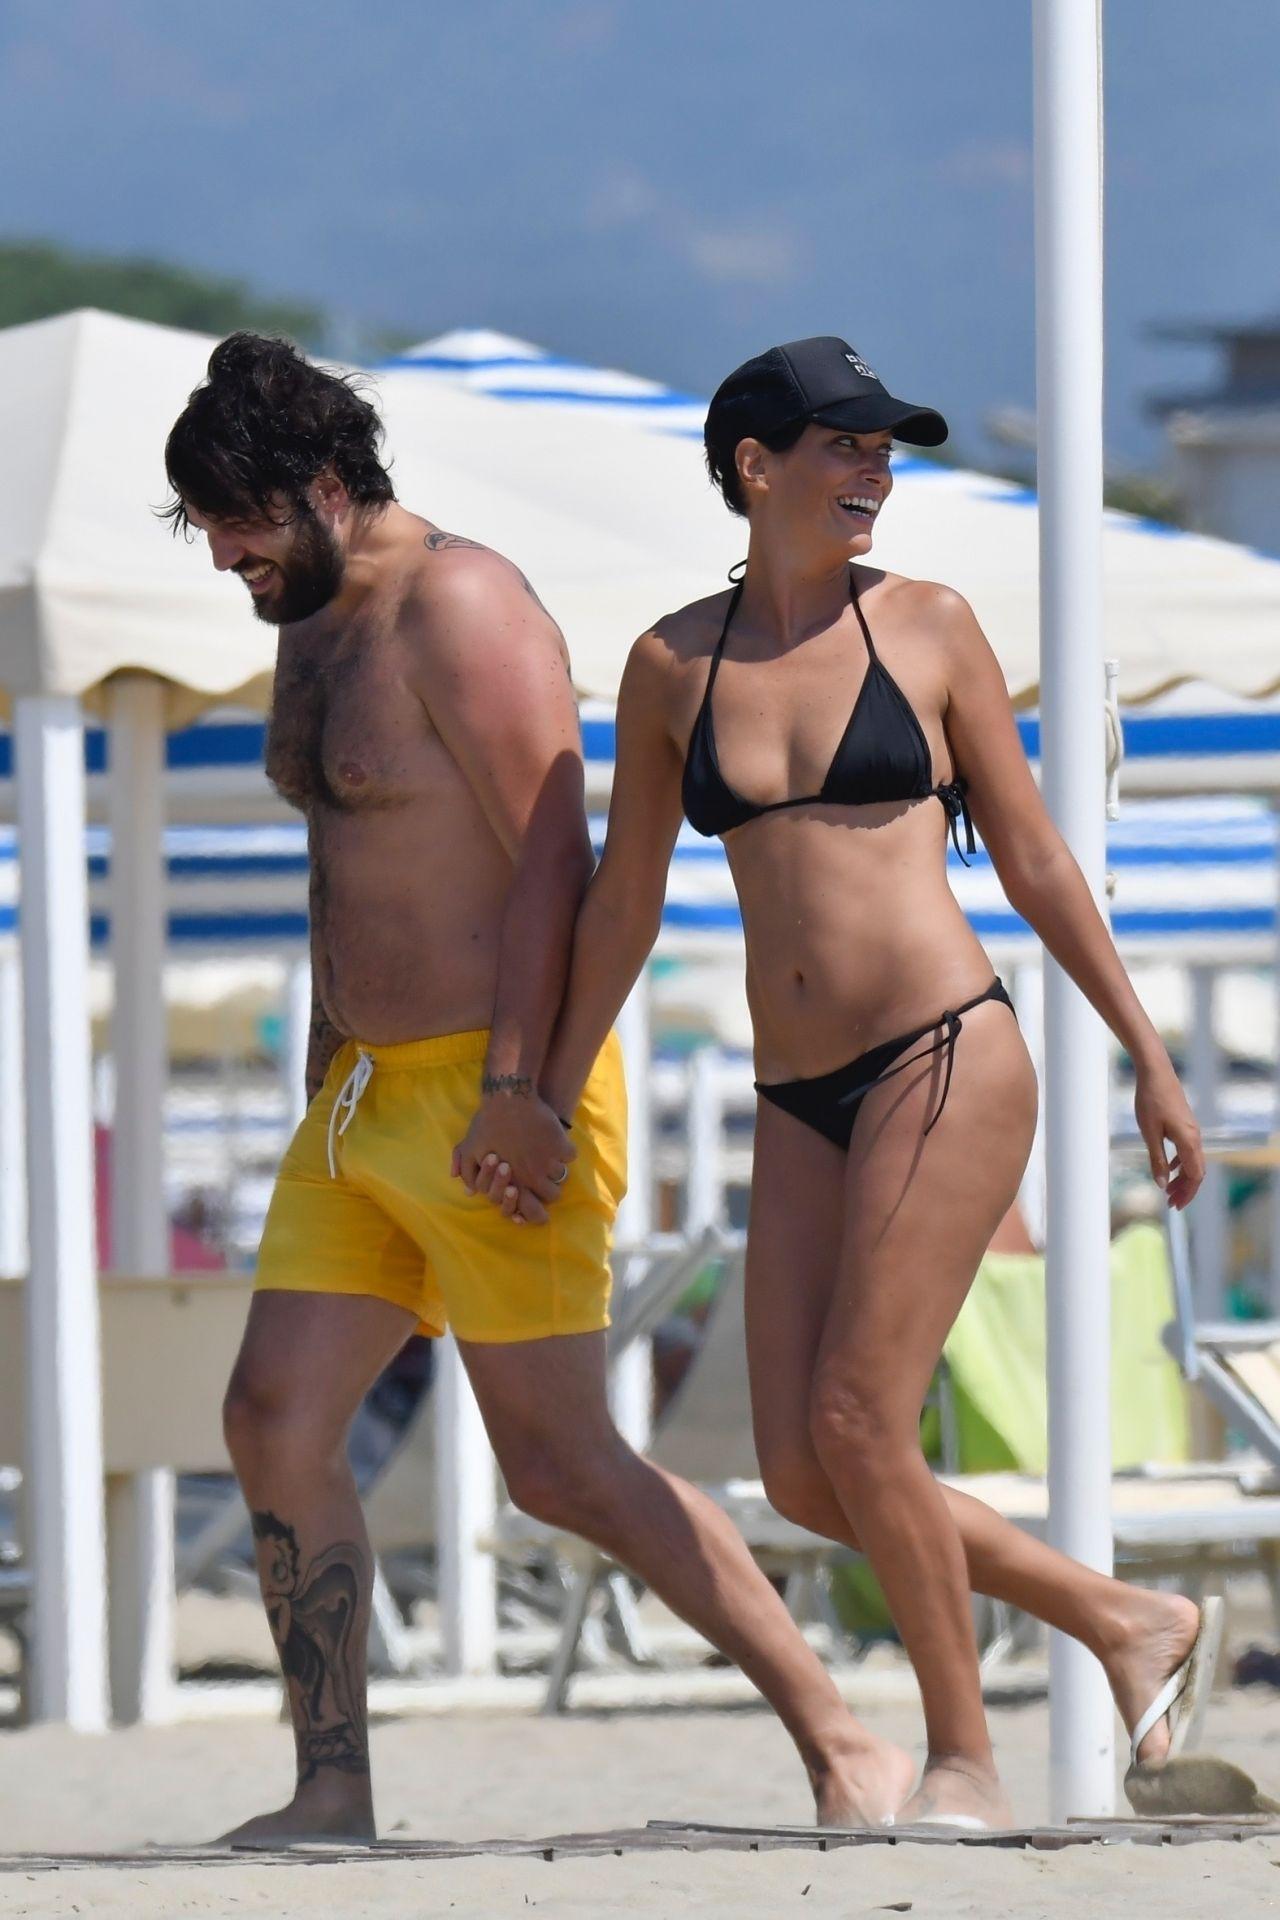 Celebrites Fernanda Lessa naked (63 foto and video), Sexy, Paparazzi, Feet, in bikini 2017